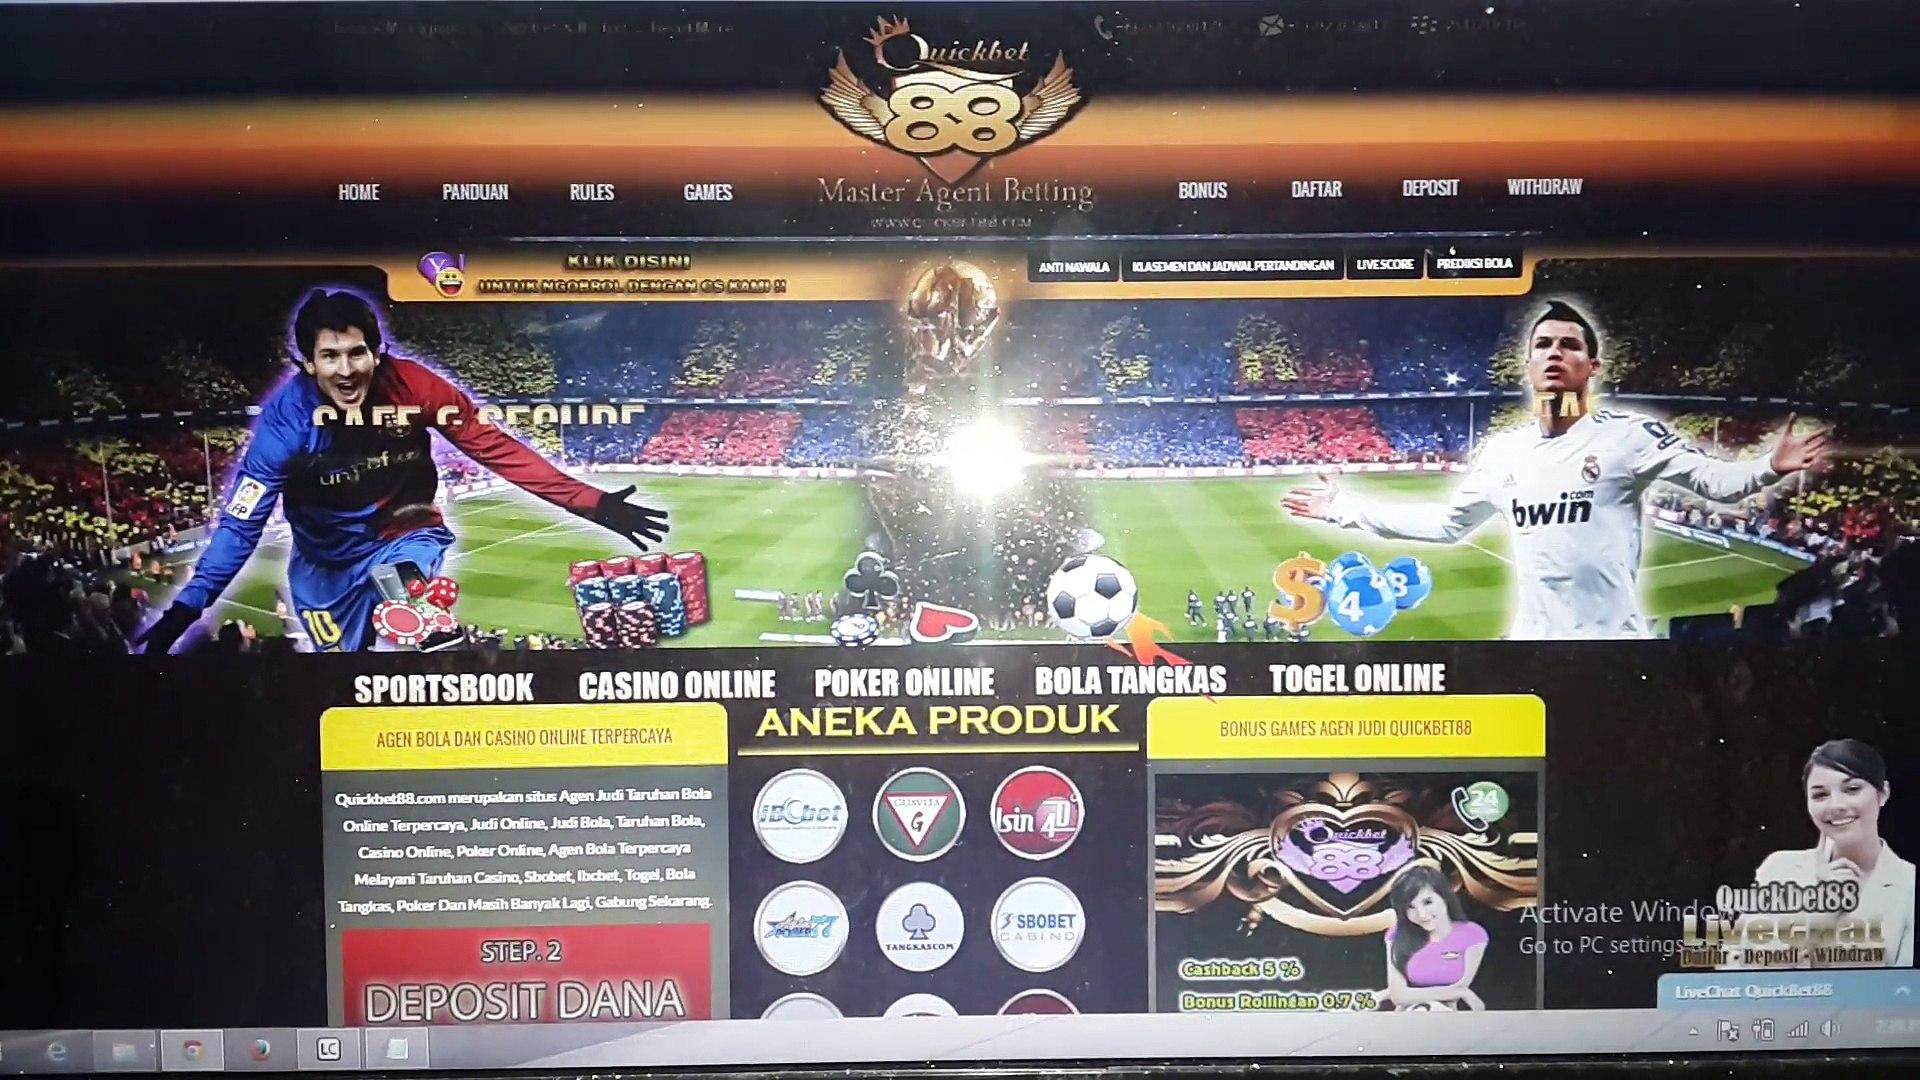 Quickbet88.com Agen Judi Bola Terpercaya, Casino Online